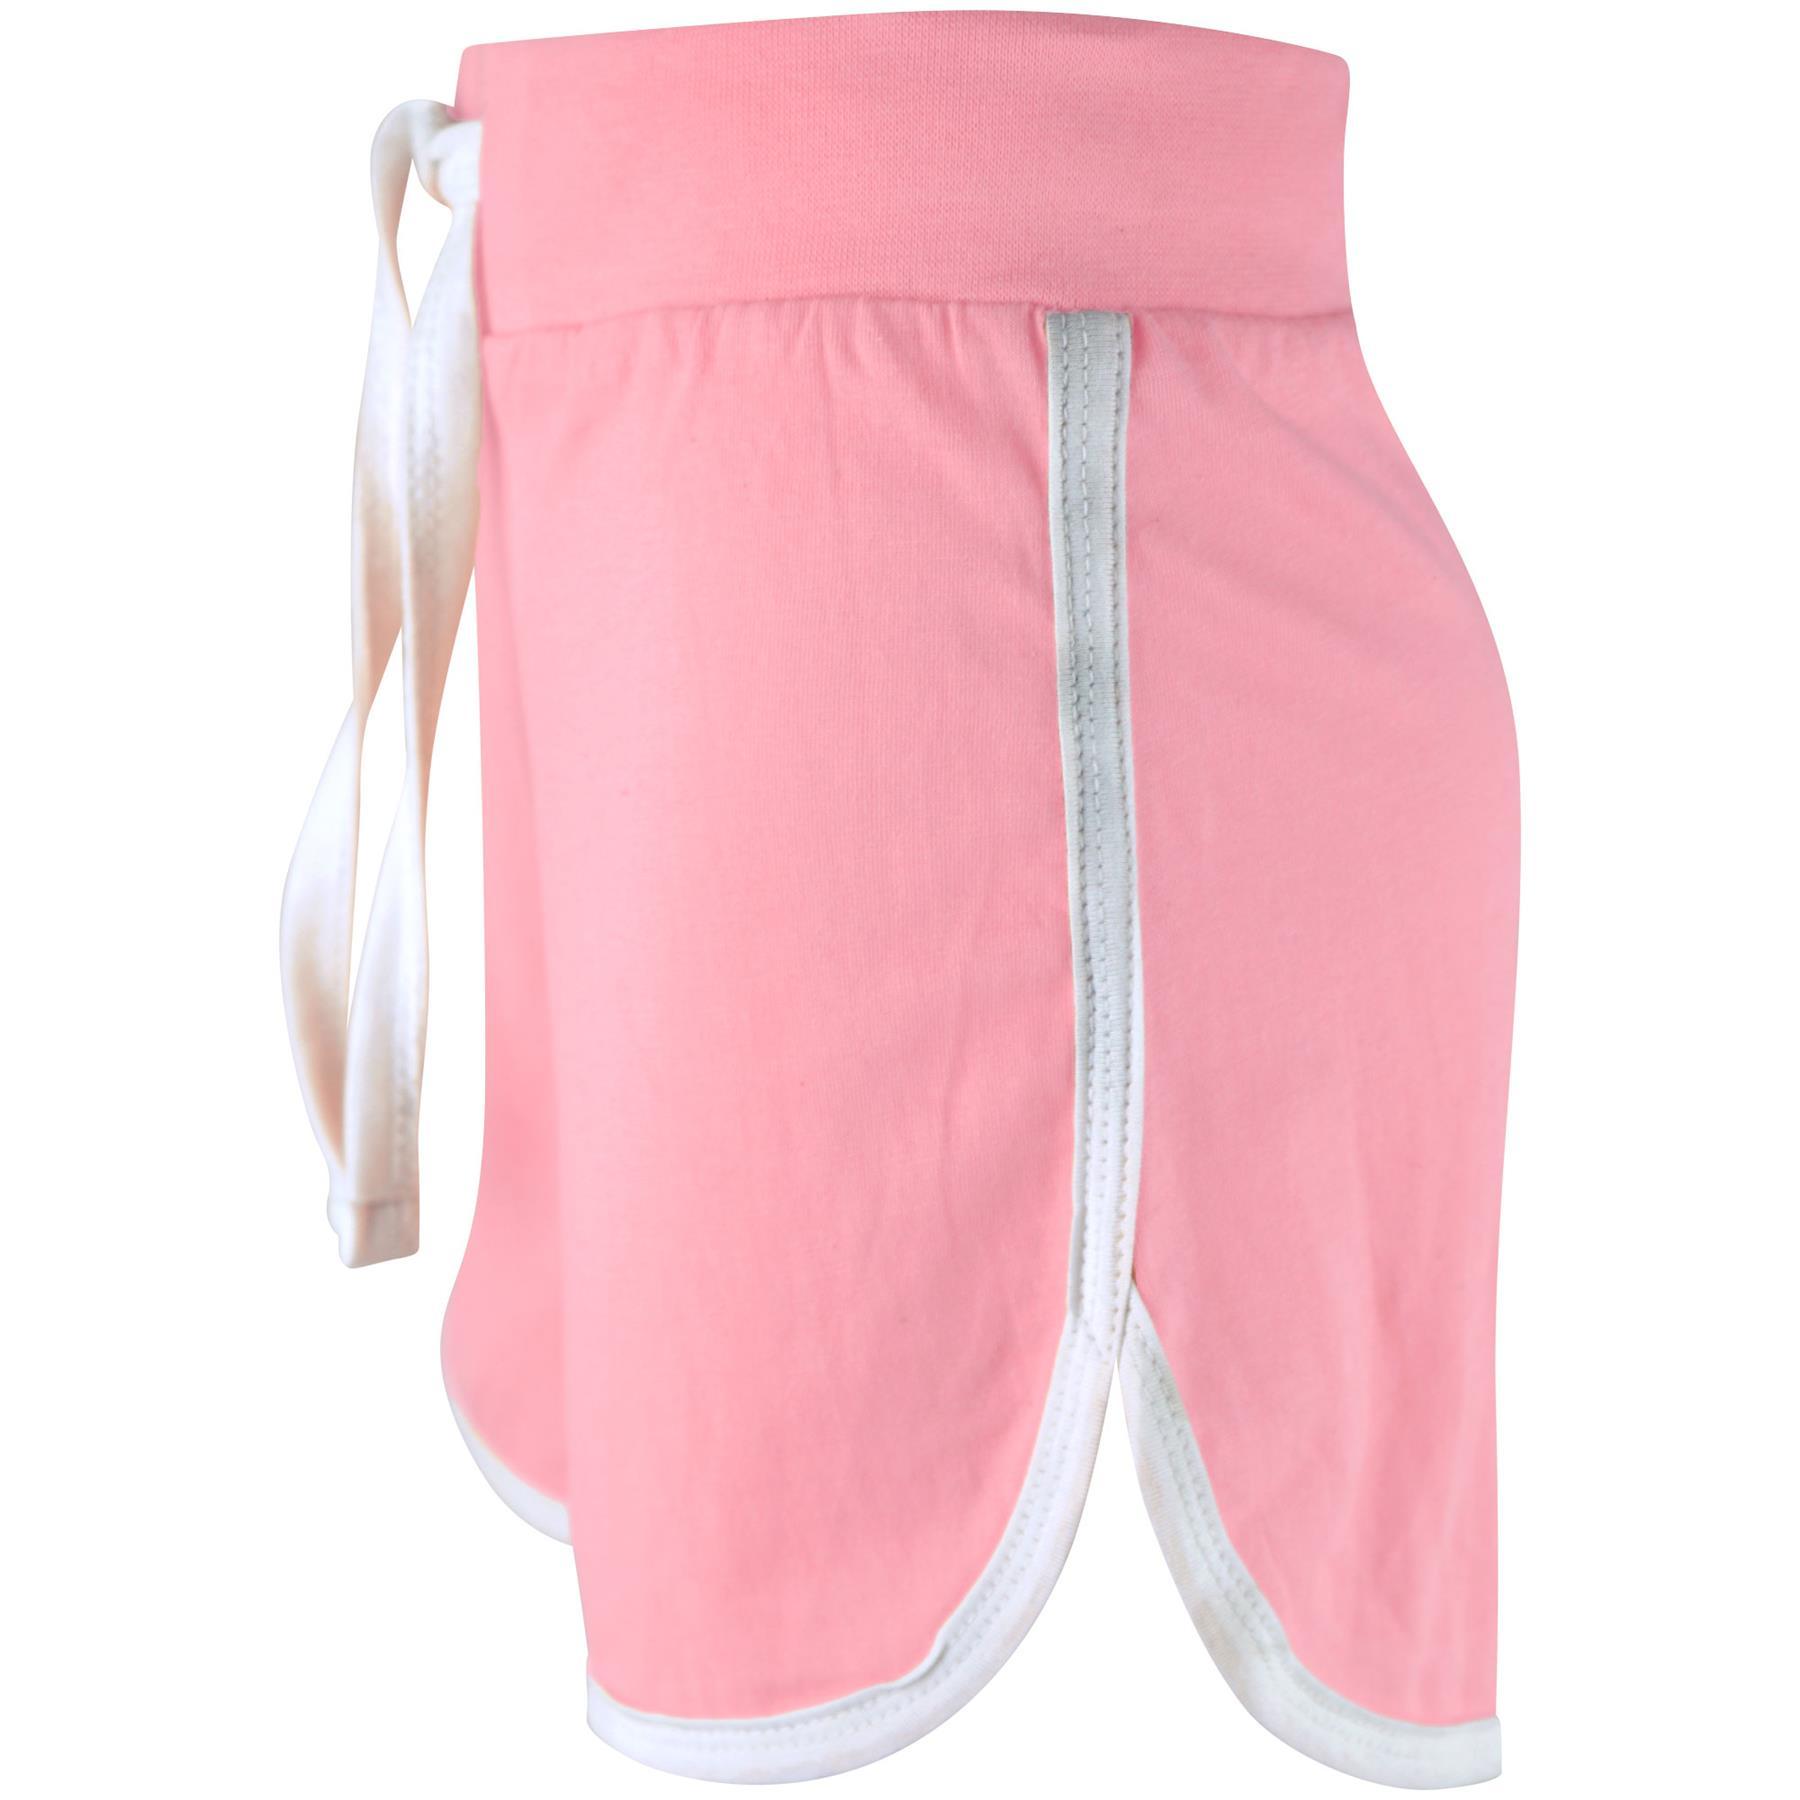 Kids-Girls-Shorts-100-Cotton-Dance-Gym-Sports-Summer-Hot-Short-Pants-2-13-Years Indexbild 4